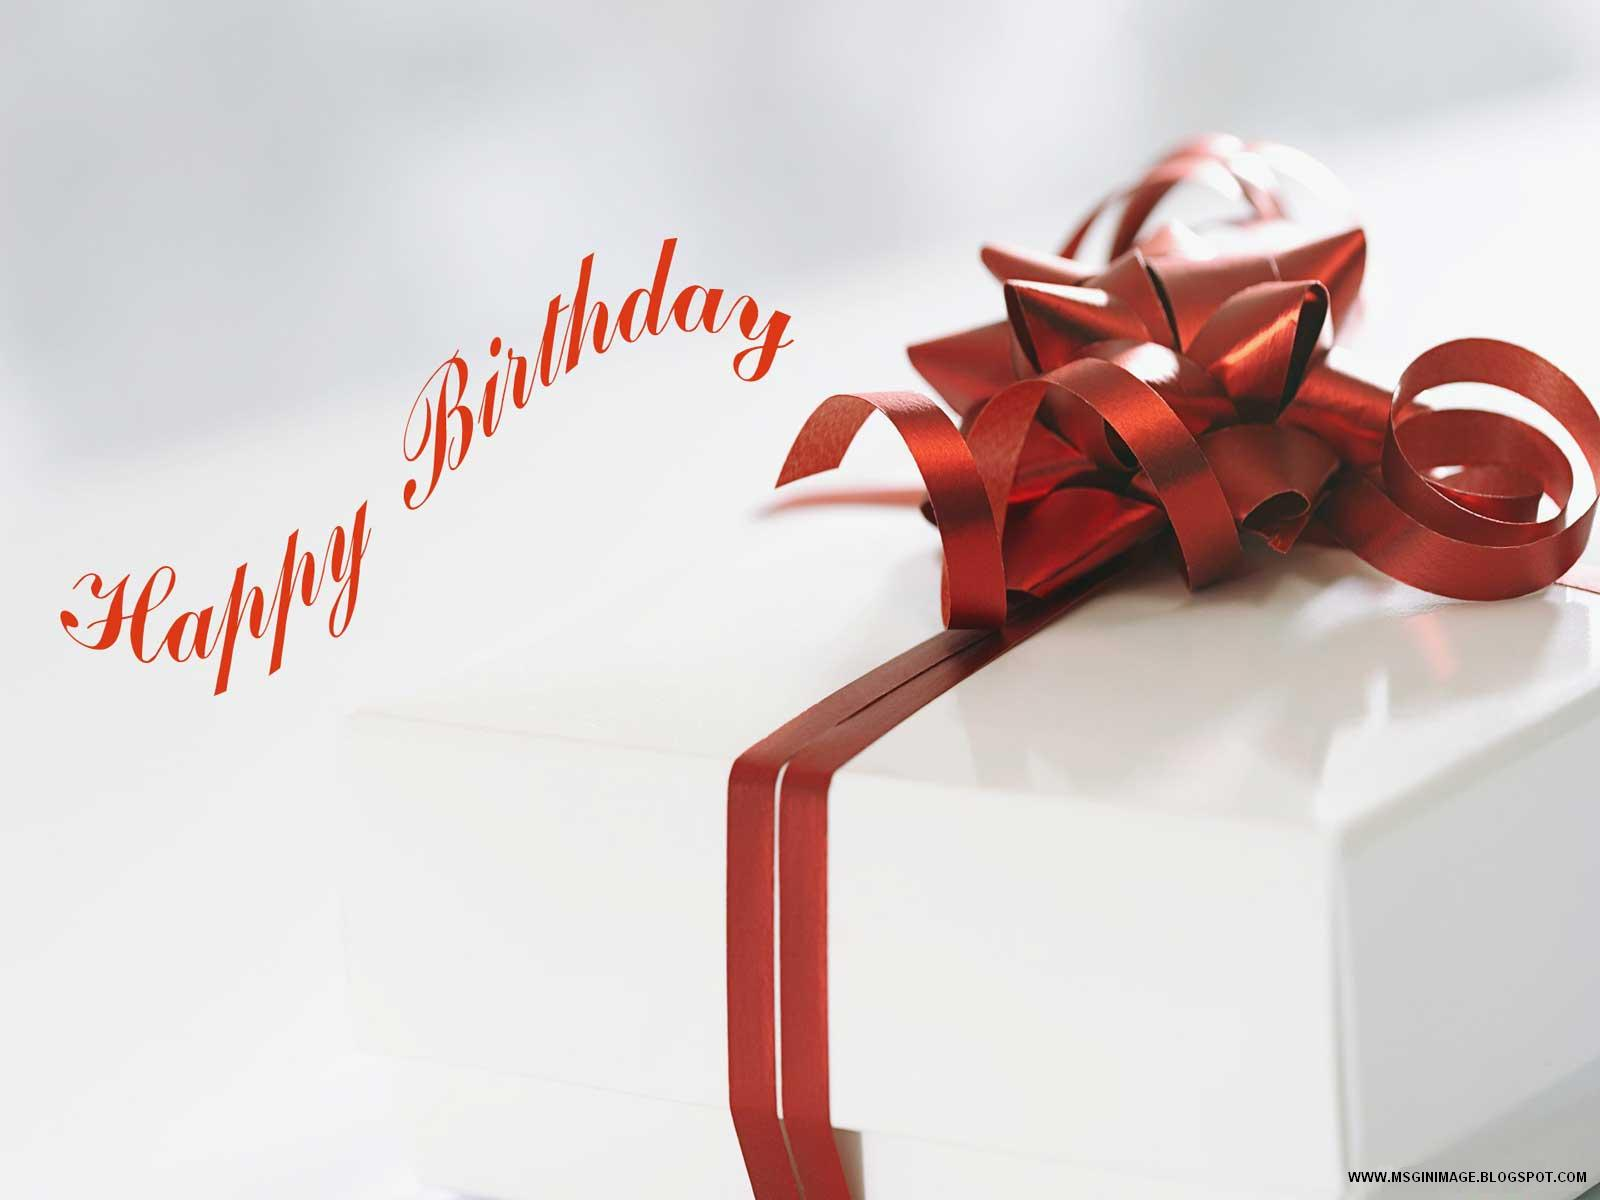 http://1.bp.blogspot.com/-FjiMrBEoFaM/UN9EI63a3XI/AAAAAAAAAeU/kt1TjIZ6Ur8/s1600/Happy+Birthday+Gift+surprise.jpg